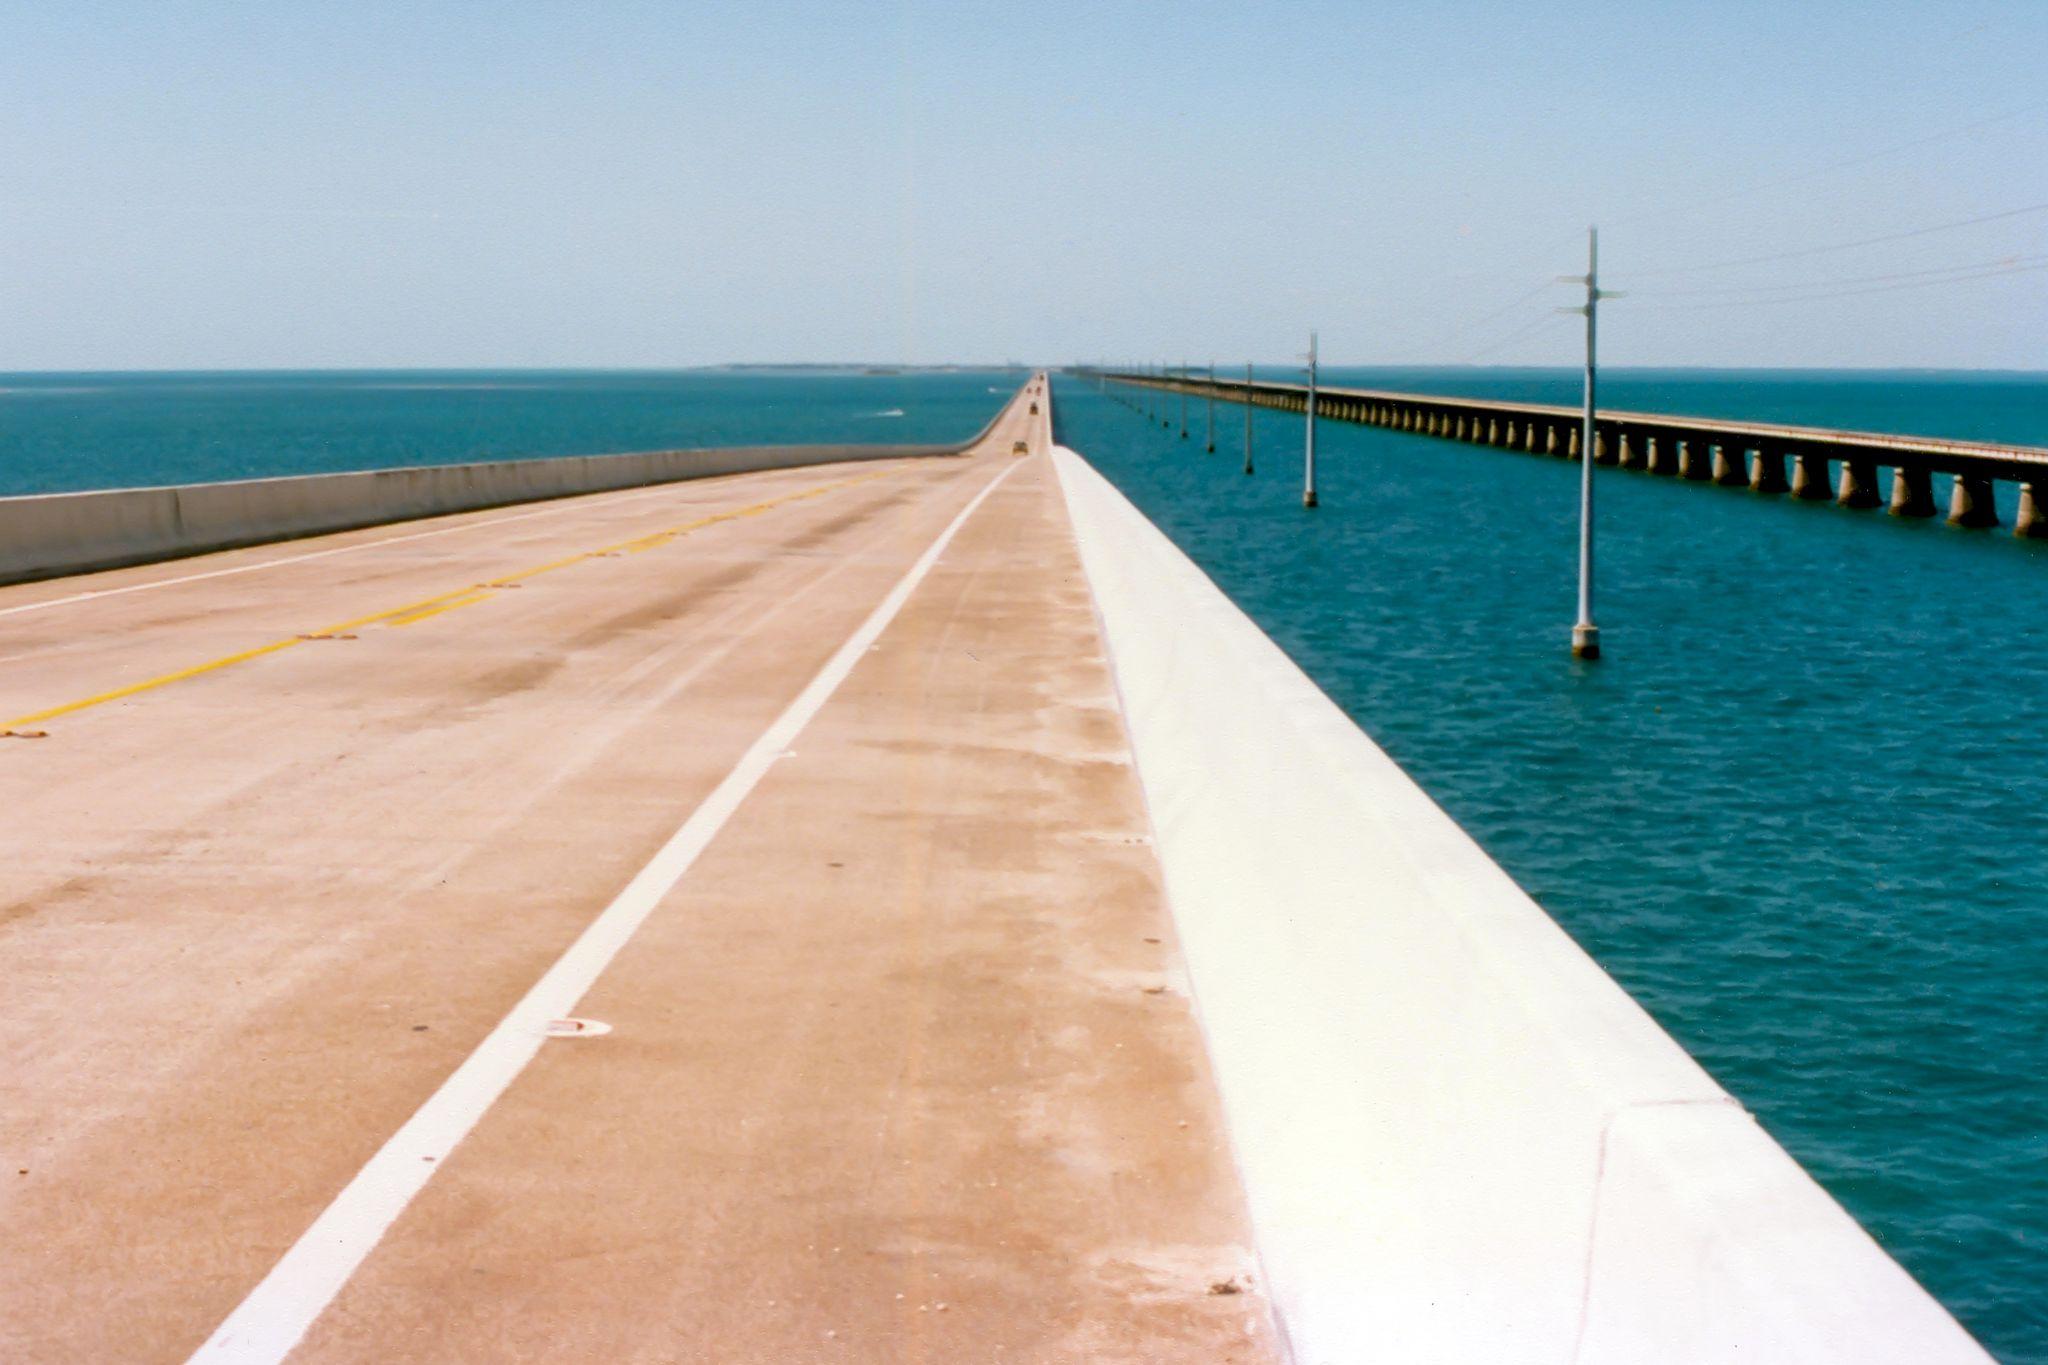 The 7 Mile Bridge by BadgerBob